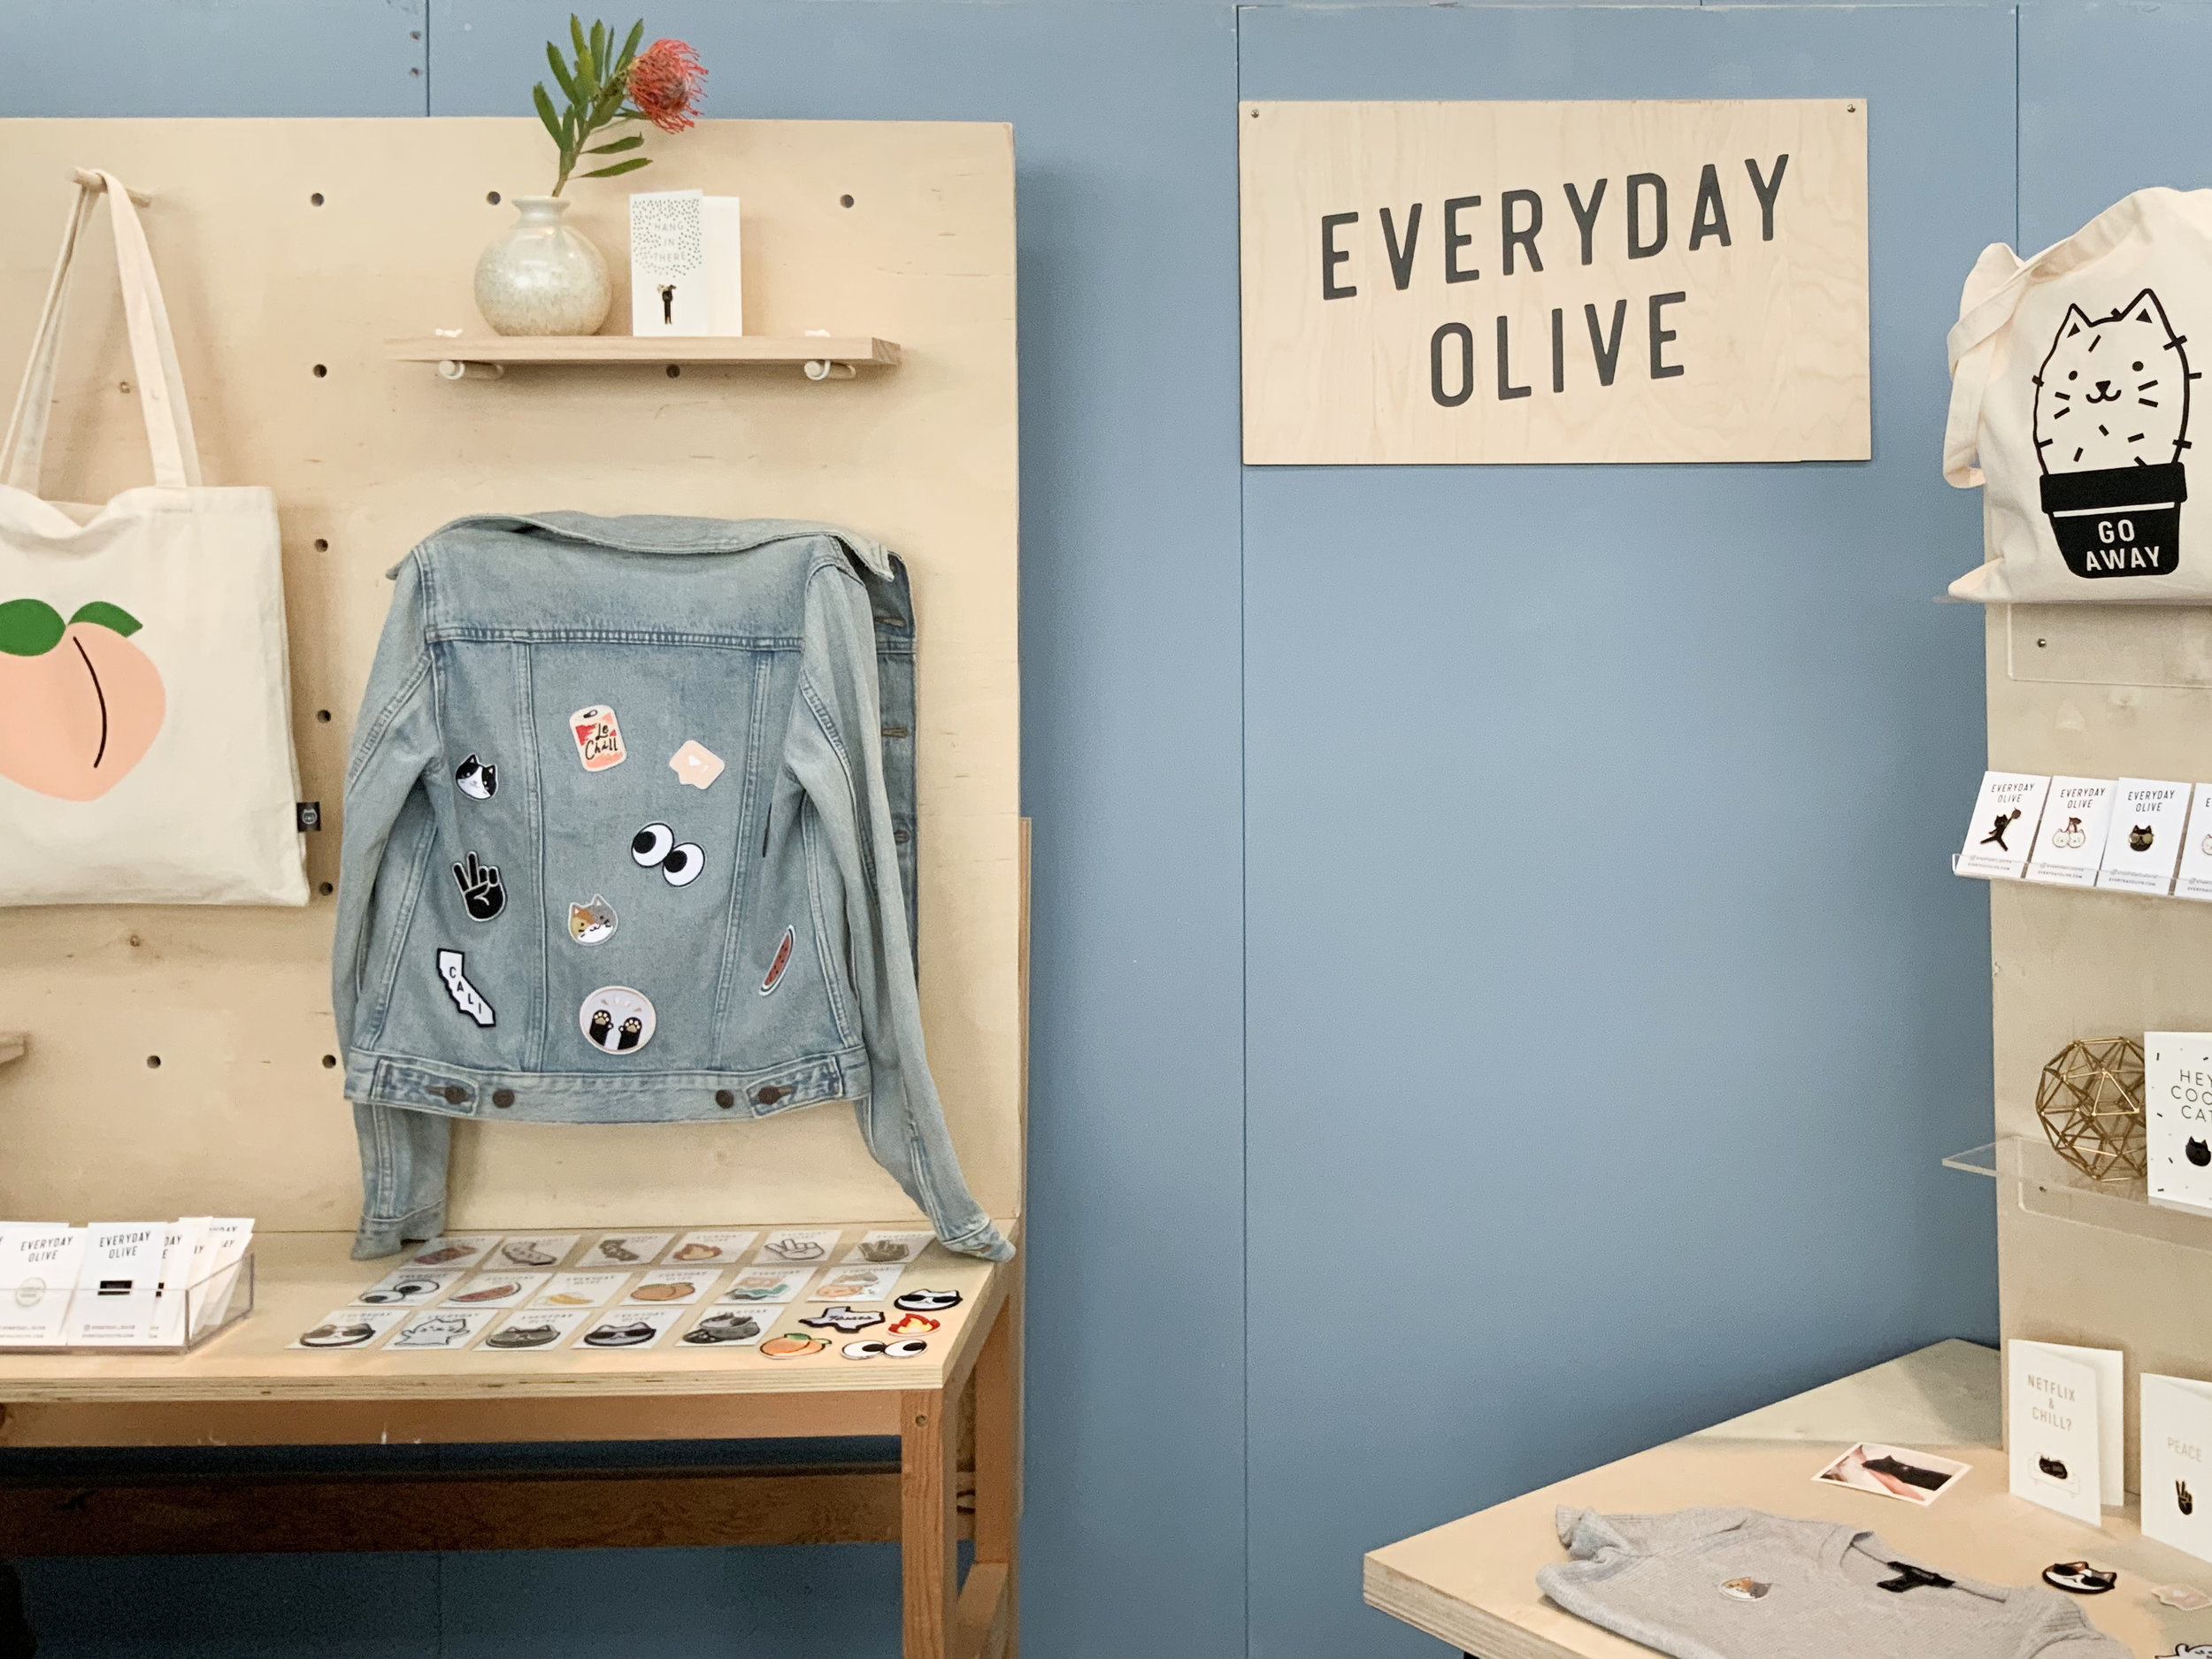 Everyday Olive Photo Jan 08, 2 46 02 PM.jpg